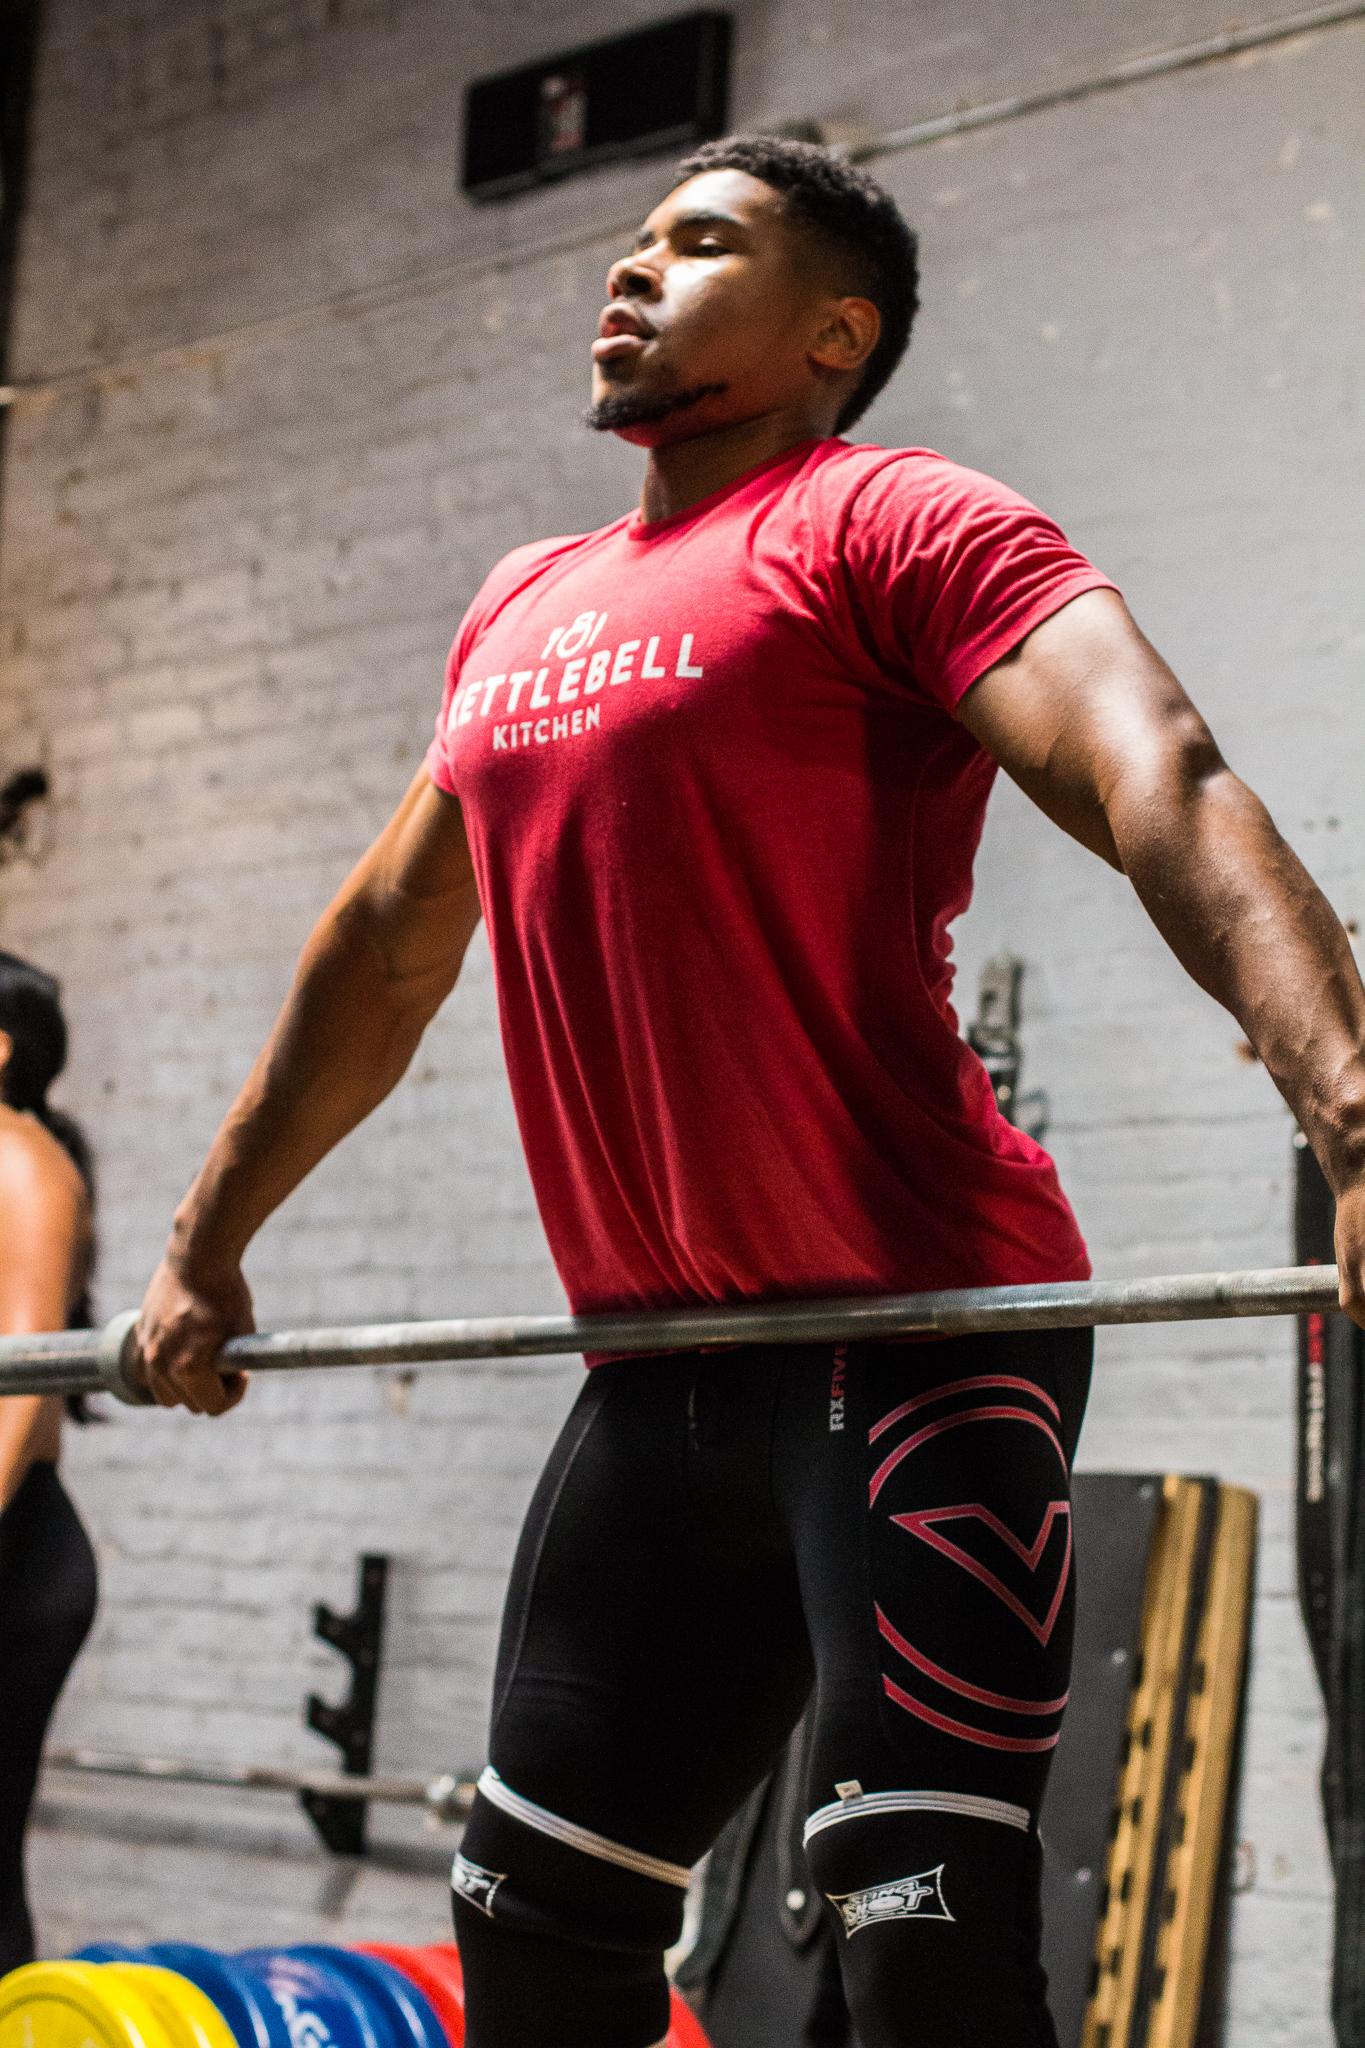 james-wright-visit-brooklyn-new-york-weightlifting-coach-teammates-october-2016 (9 of 92).jpg